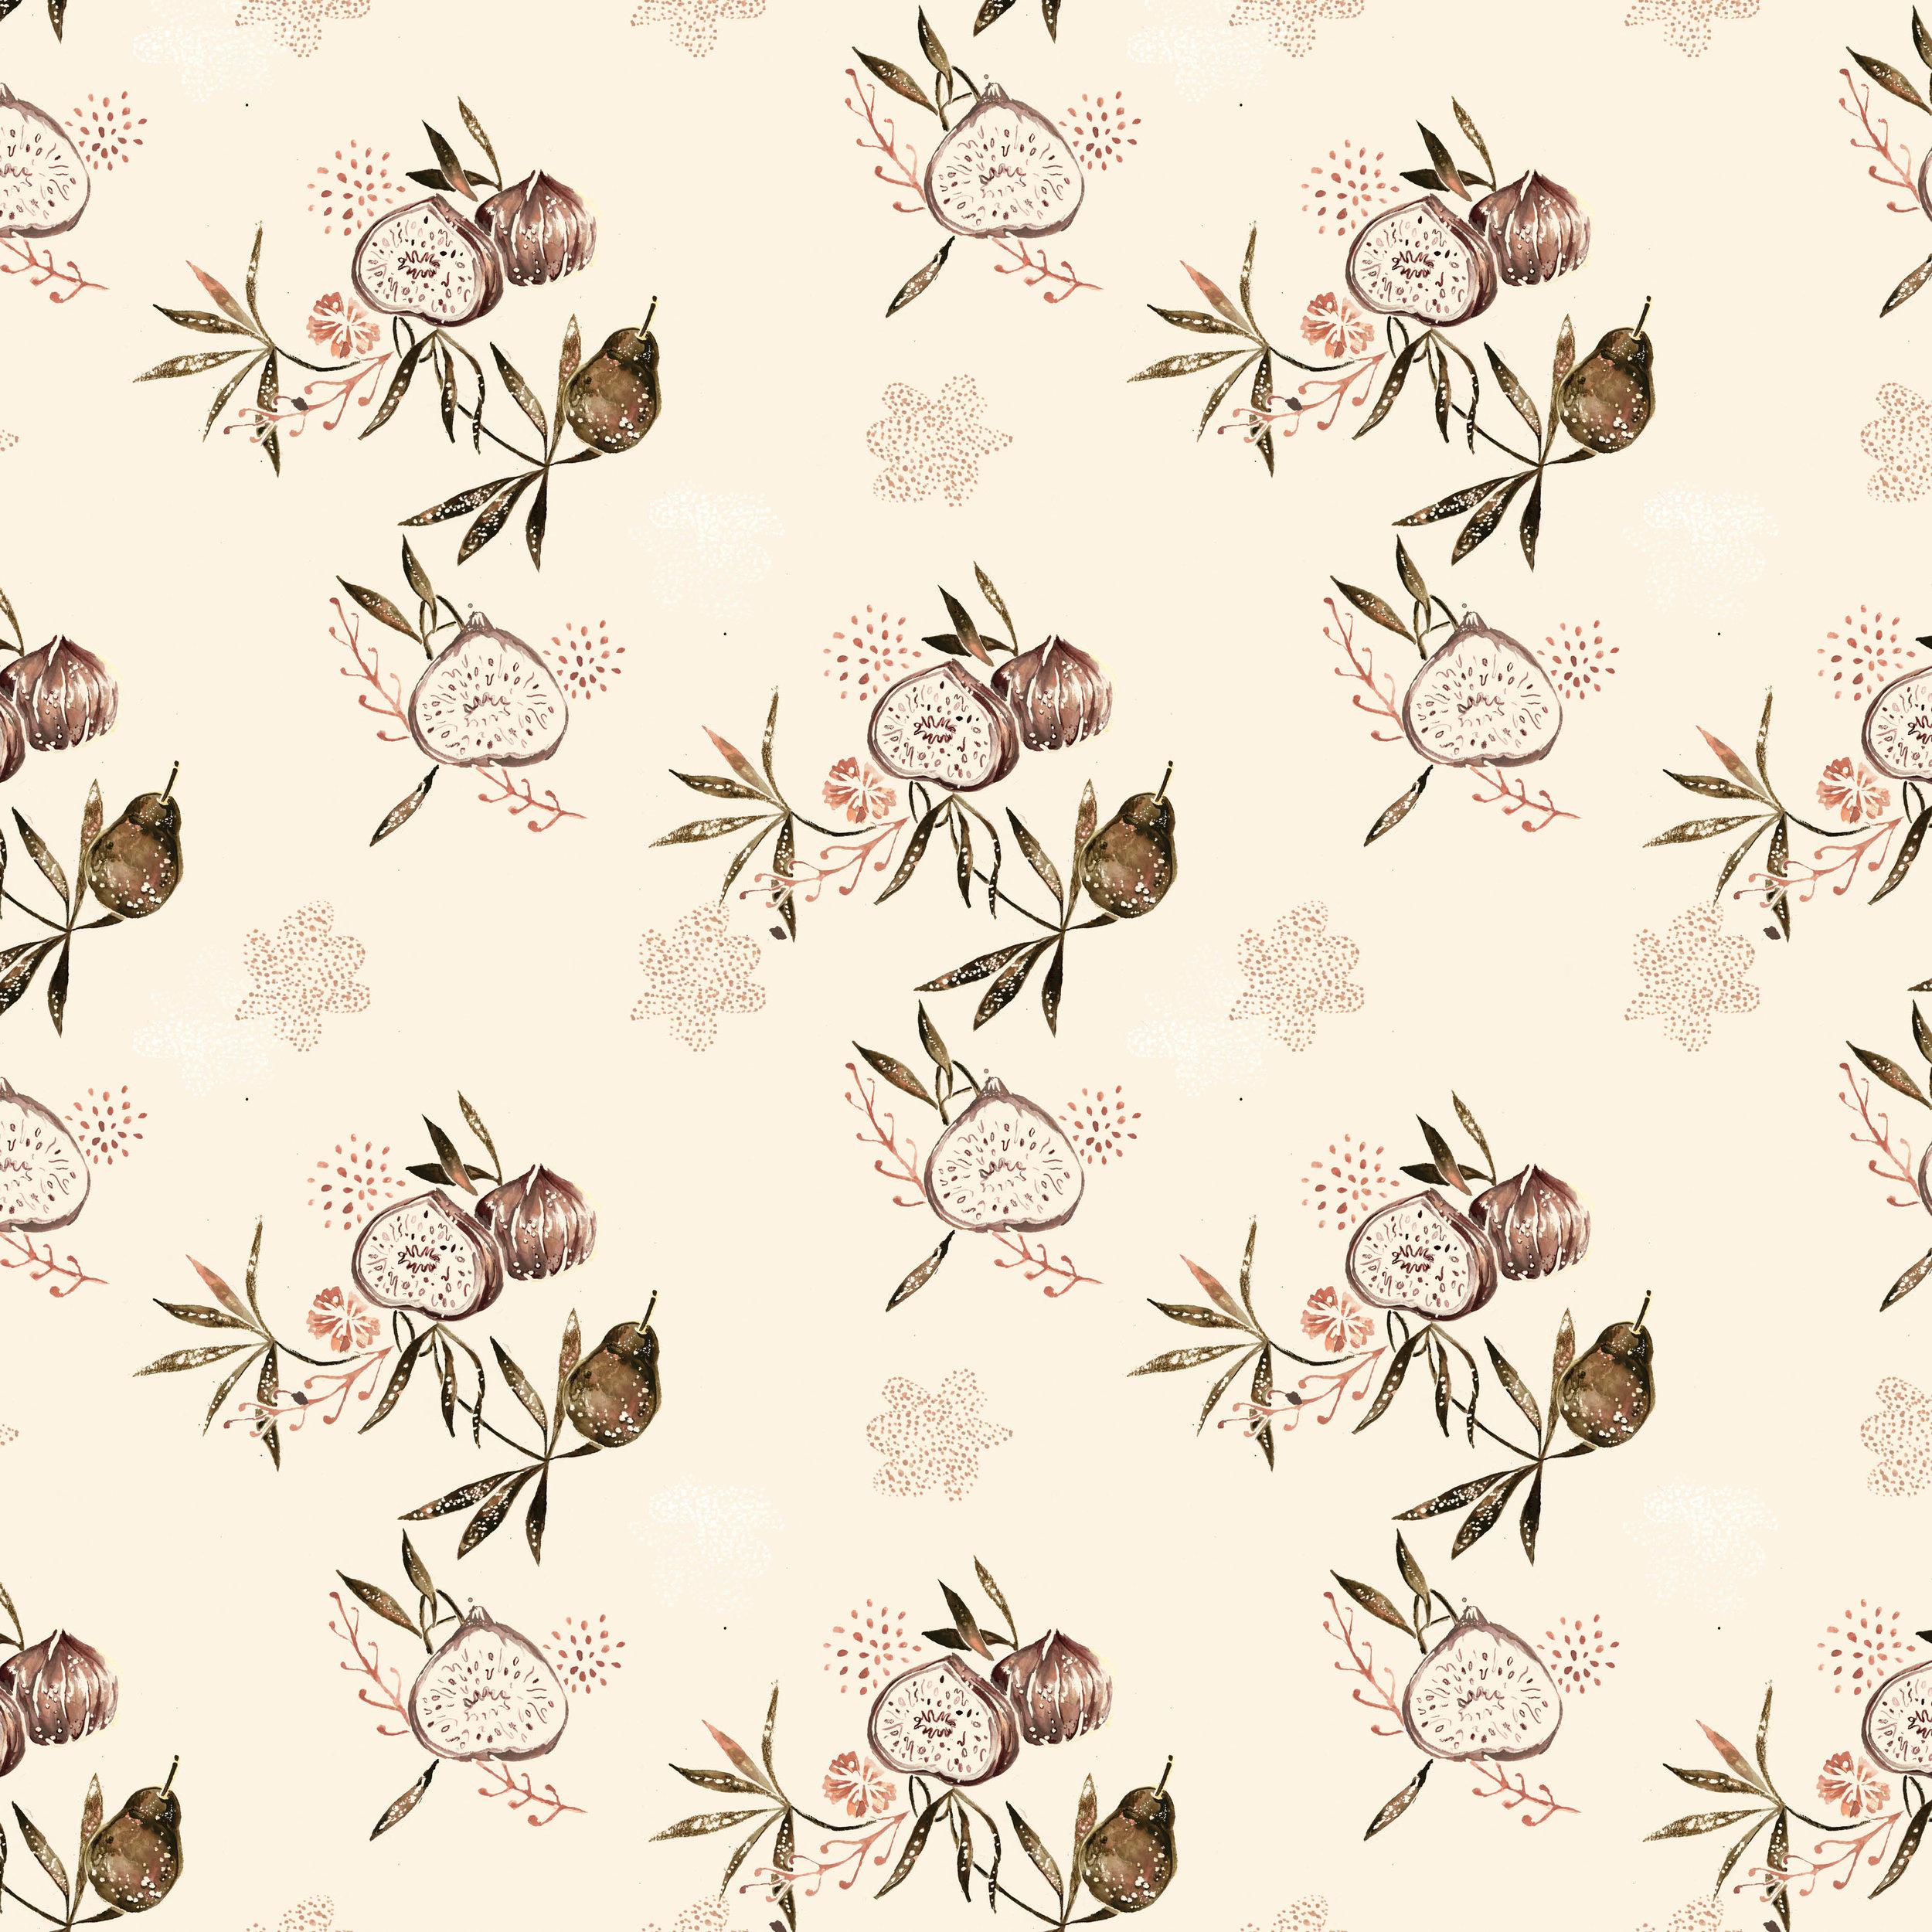 Textilefolio_banh13.jpg